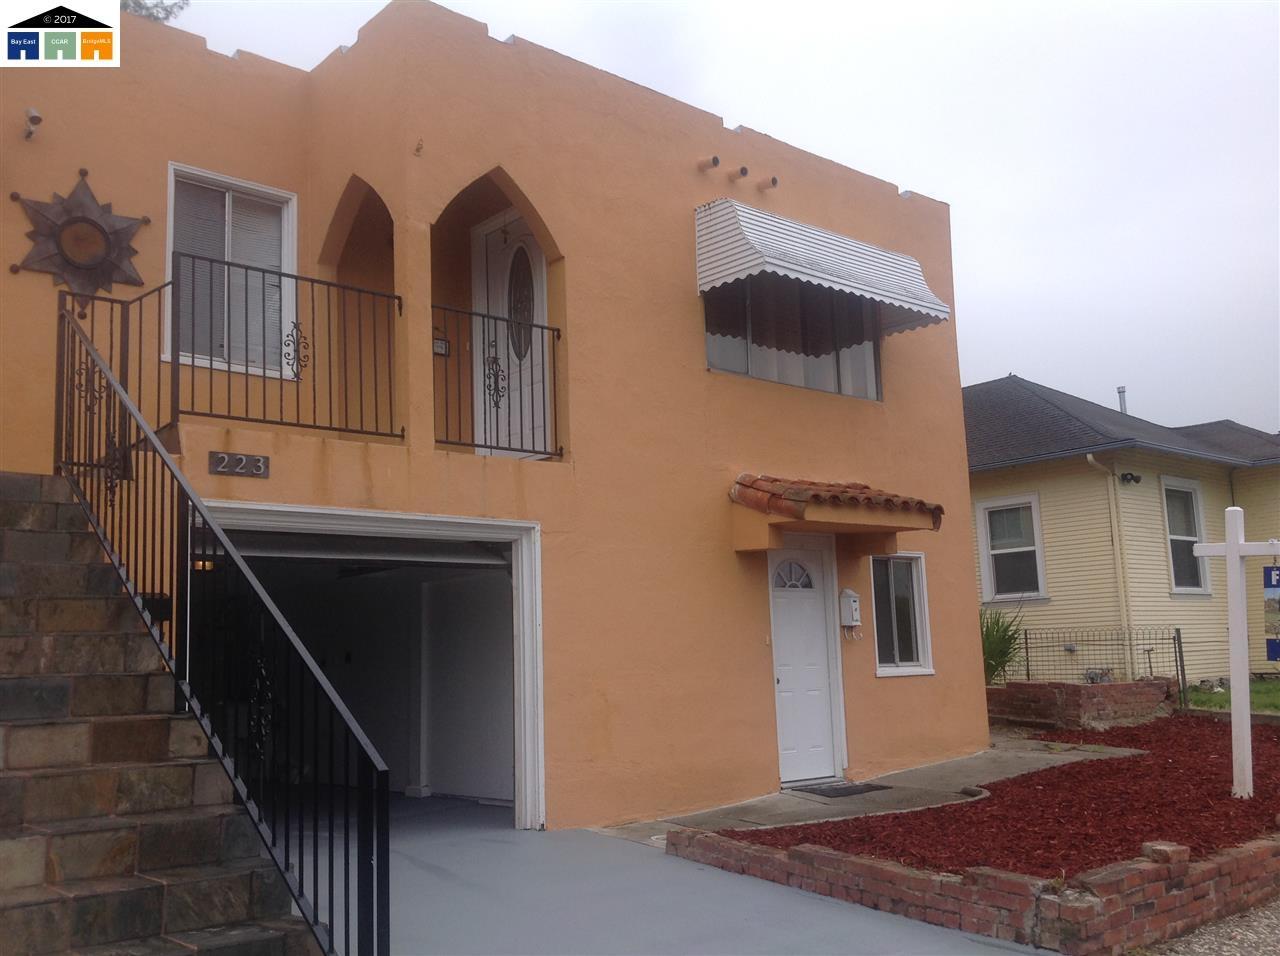 223 GARRETSON AVENUE, RODEO, CA 94572